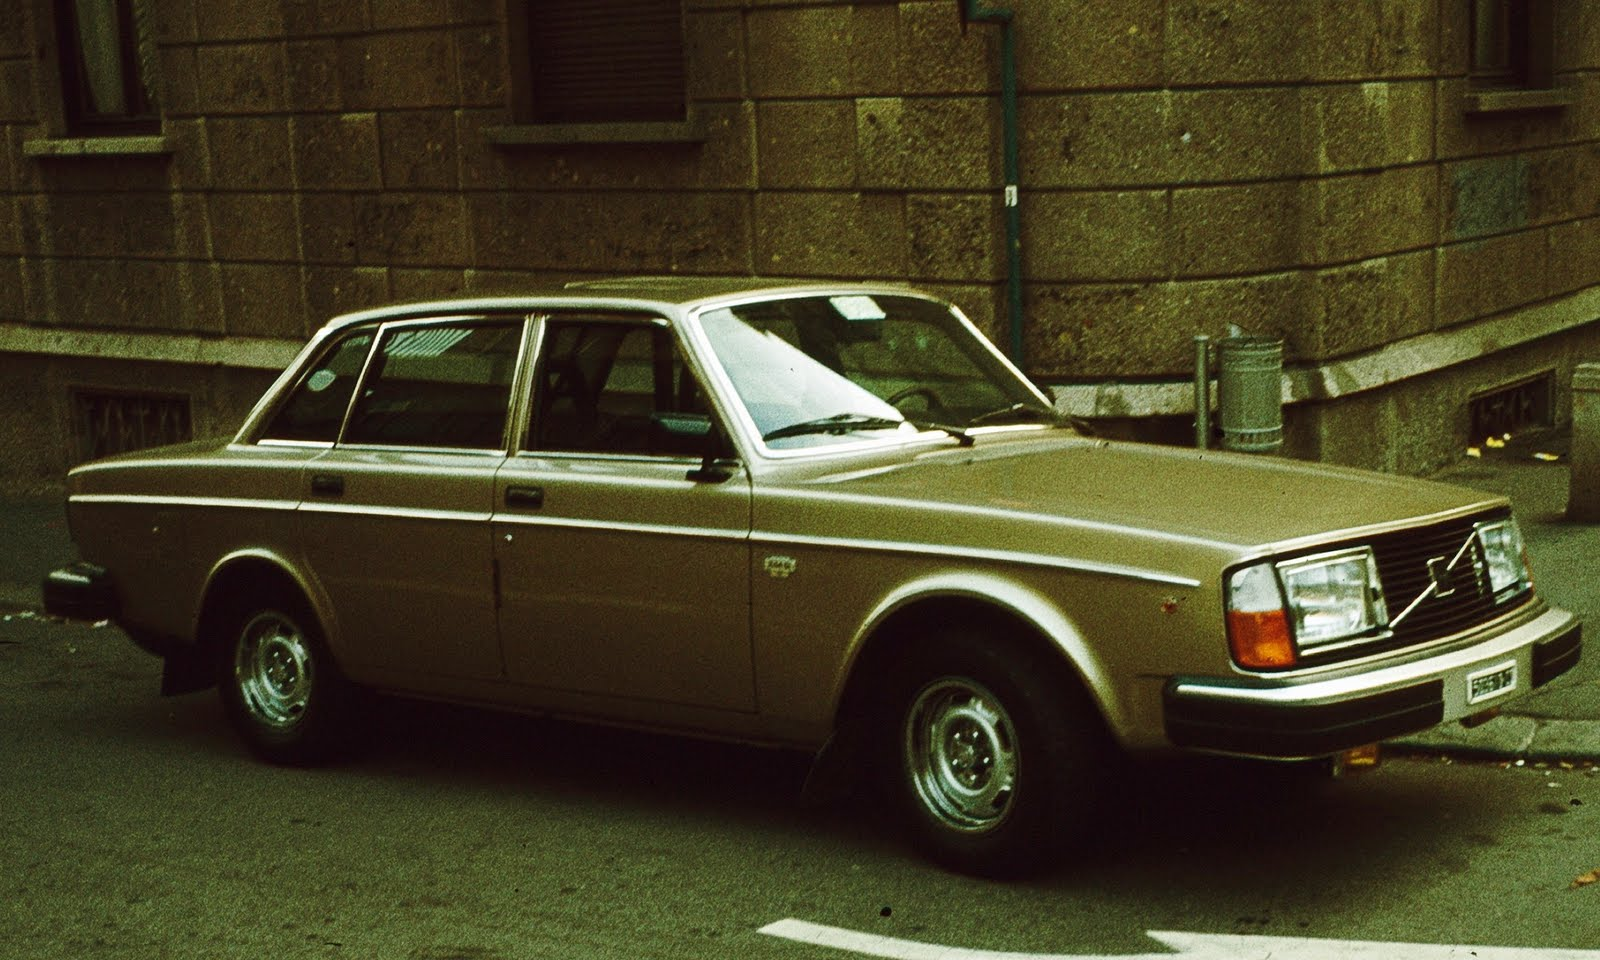 Legendary cars: October 2010